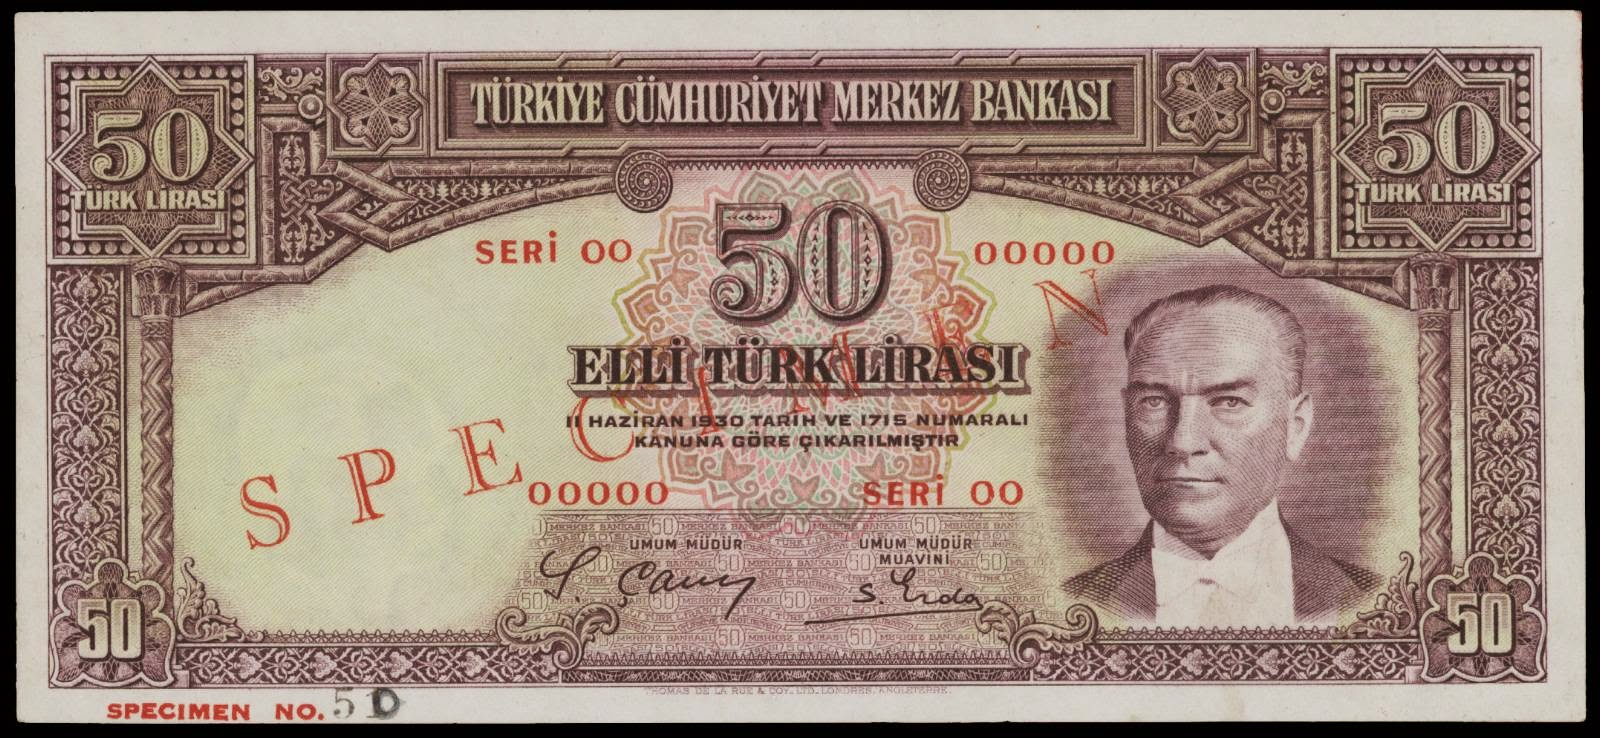 old Turkish banknotes 50 Lira note 1930 Atatürk